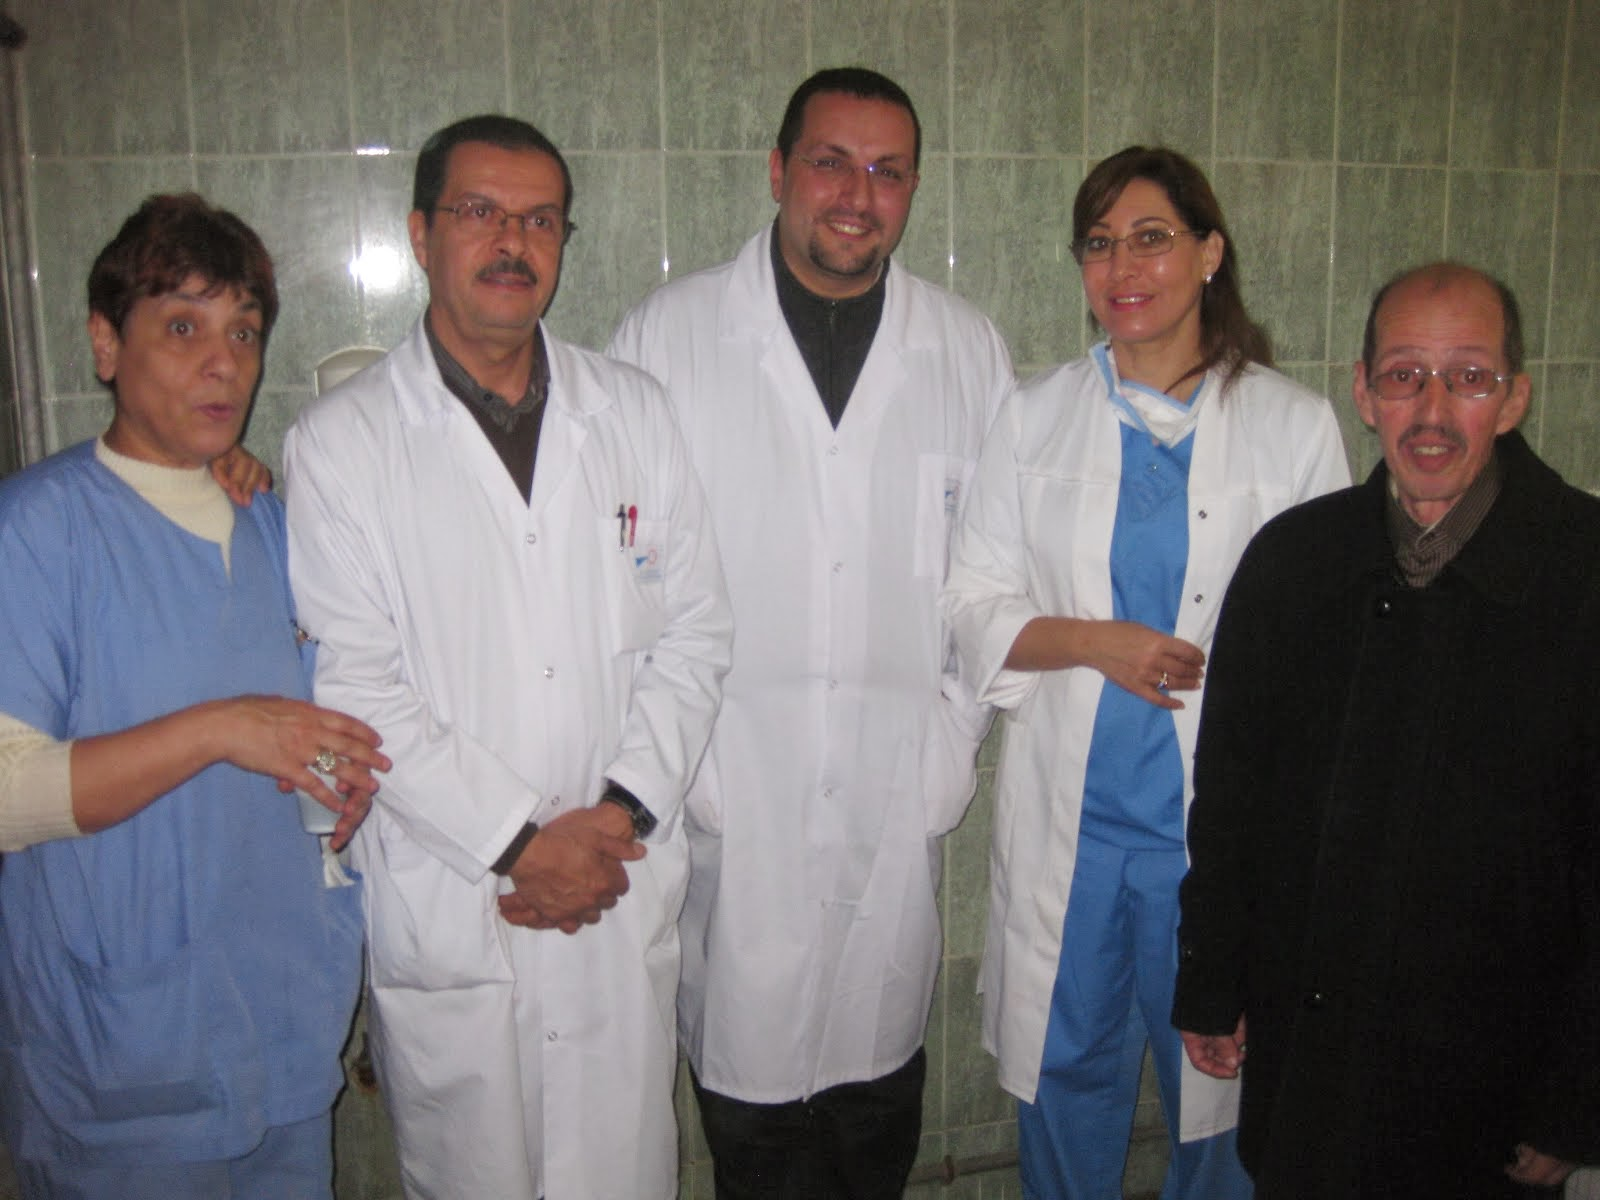 TAKRIME LES INFIRMIERS RETAITES DU BLOC OPERATOIRE HOPITAL IBNO SINA RABAT